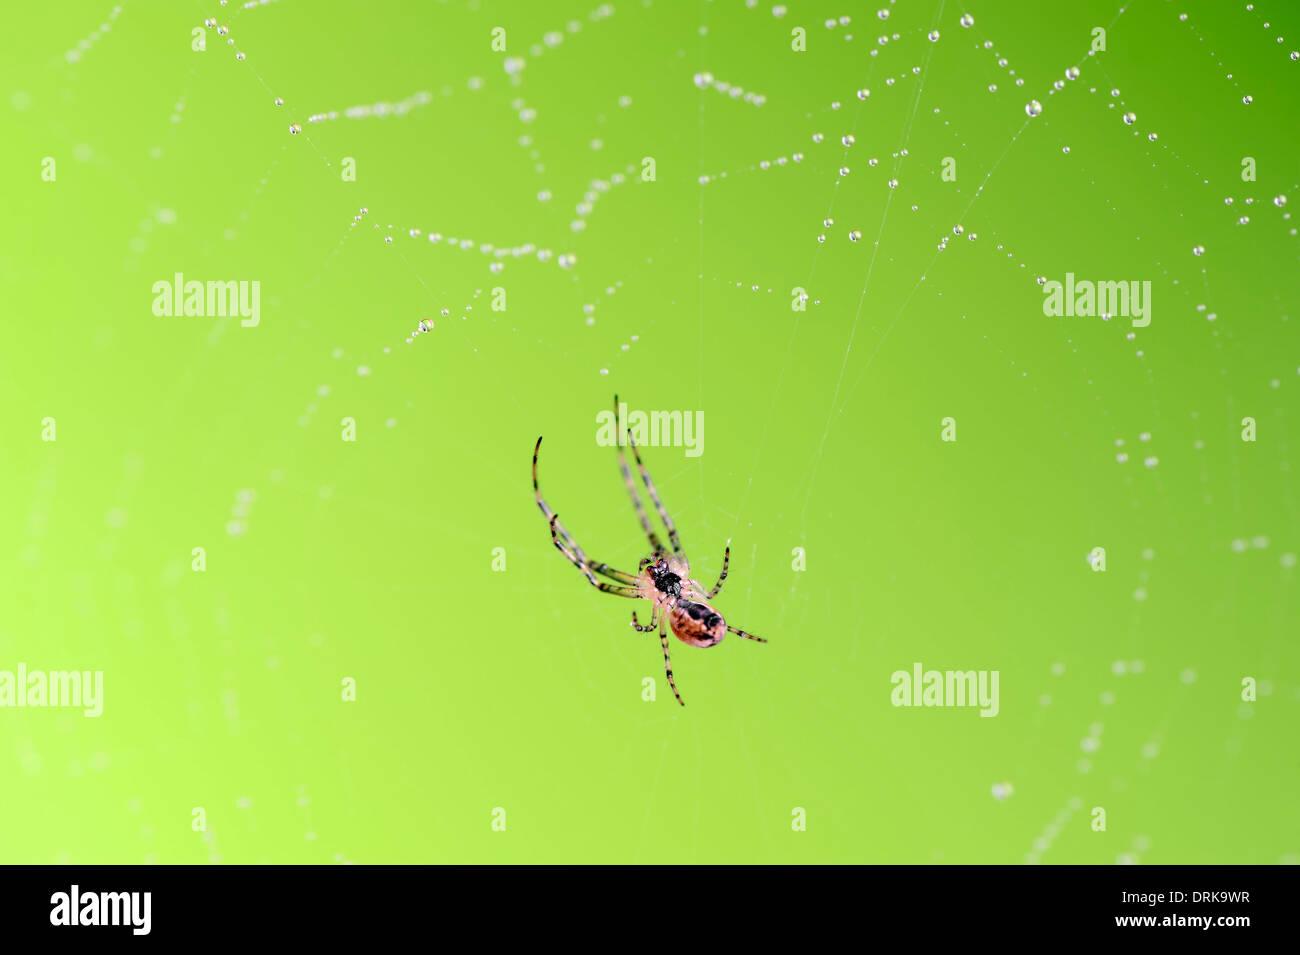 Autumn Orbweaver or Autumn Spider  in web (Metellina mengei), North Rhine-Westphalia, Germany, Europe - Stock Image